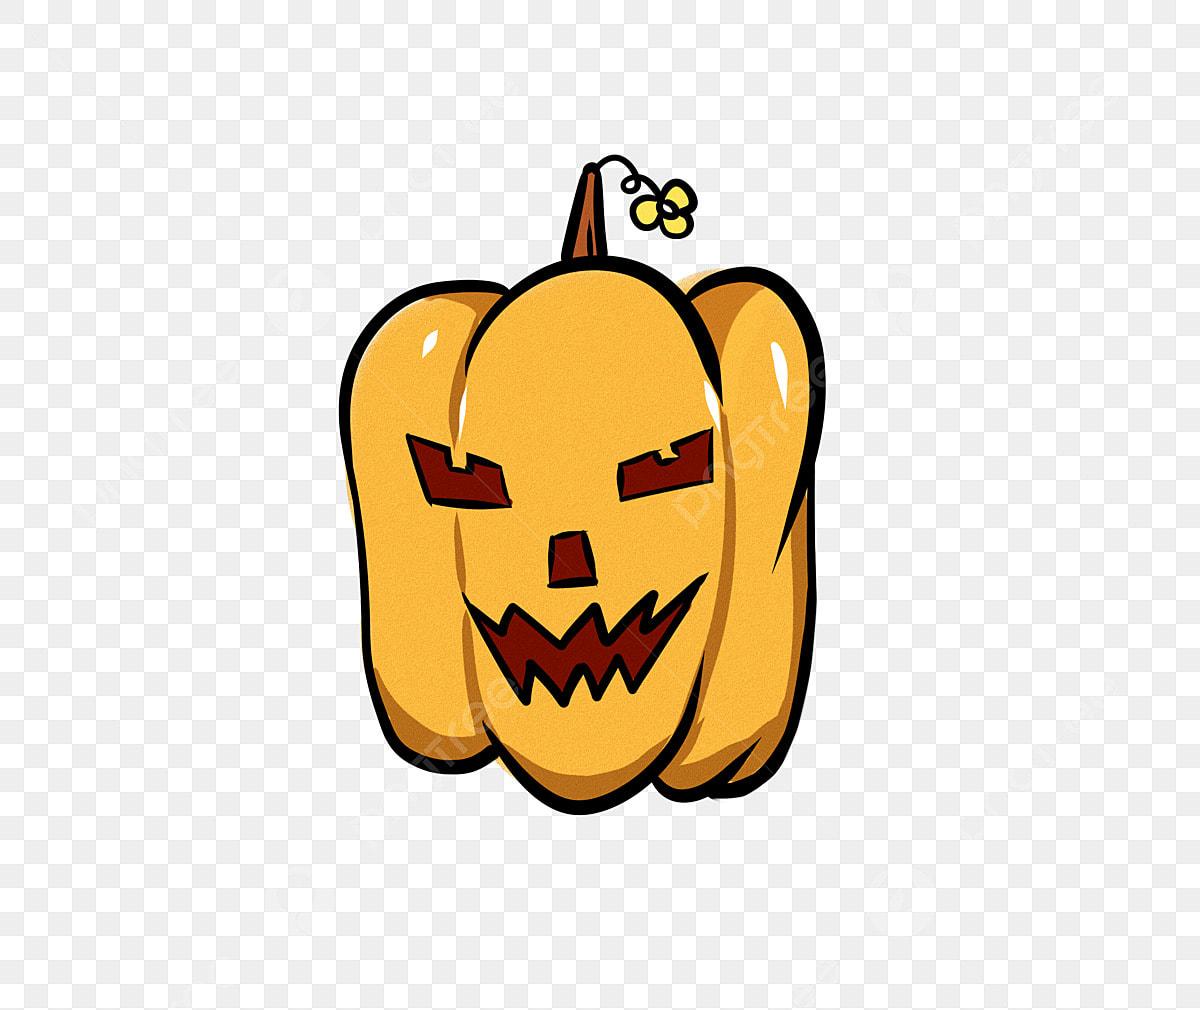 Pumpkin Clipart, Transparent PNG Clipart Images Free Download - ClipartMax